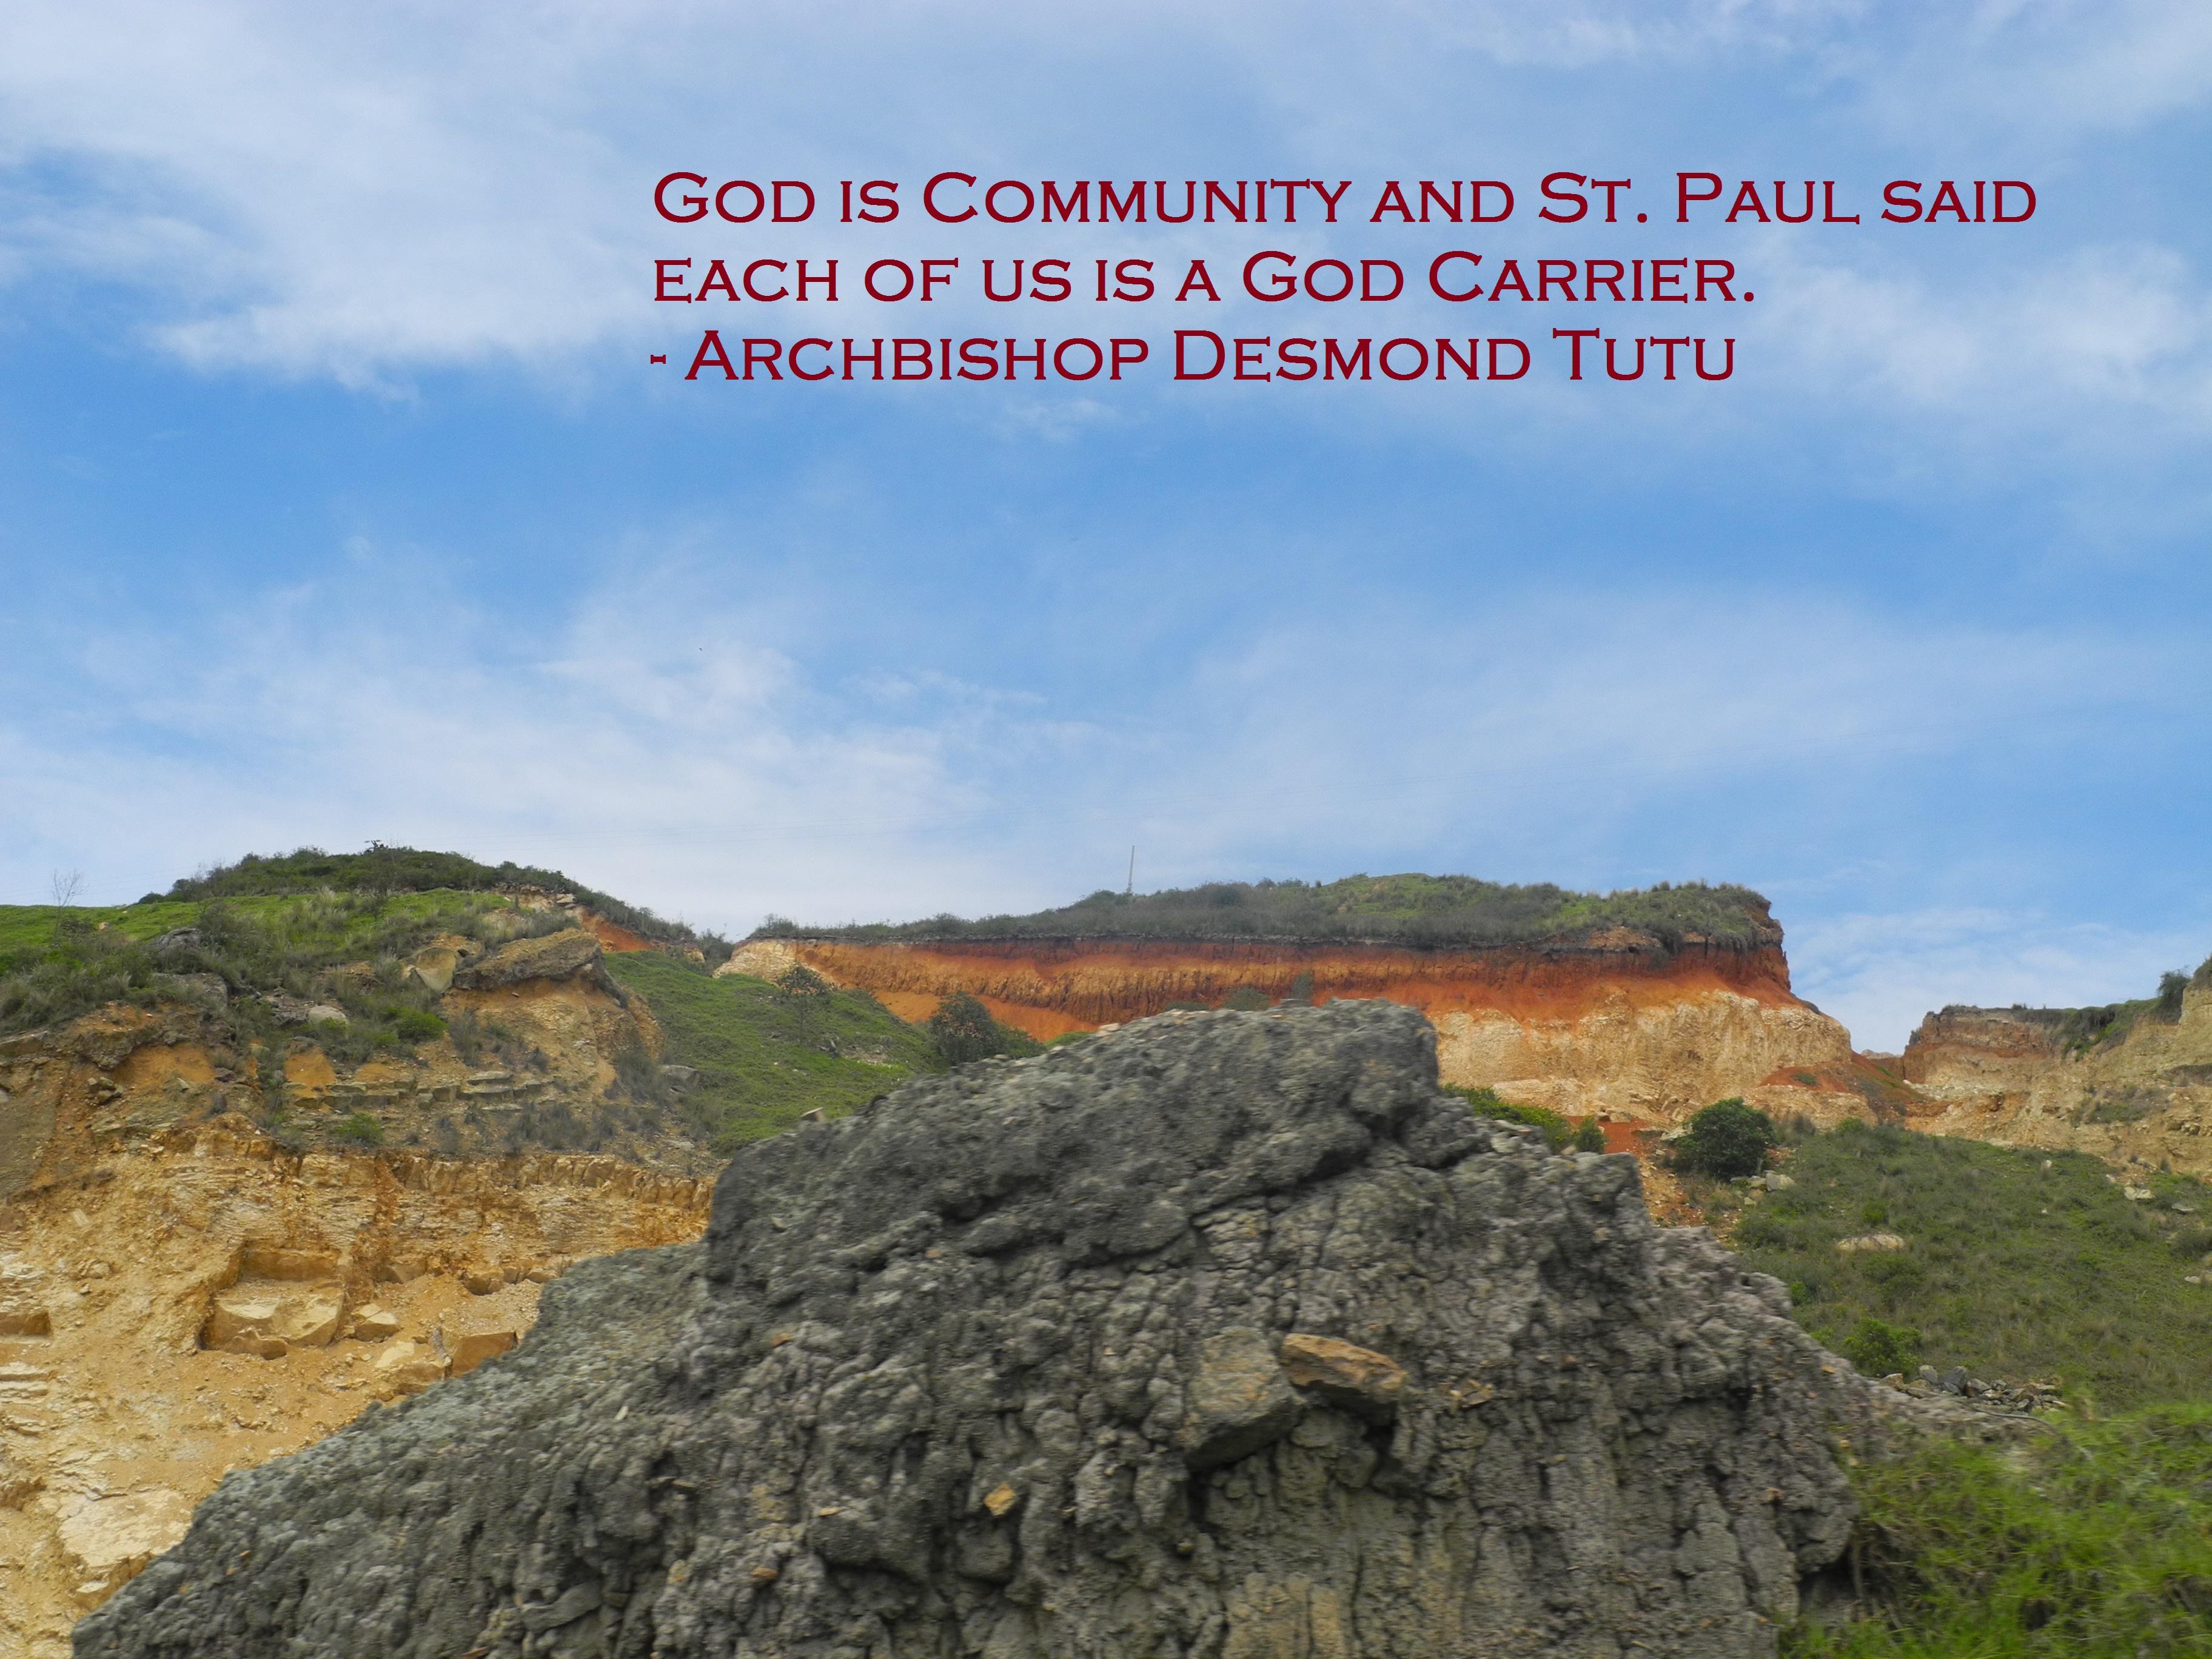 God is community.